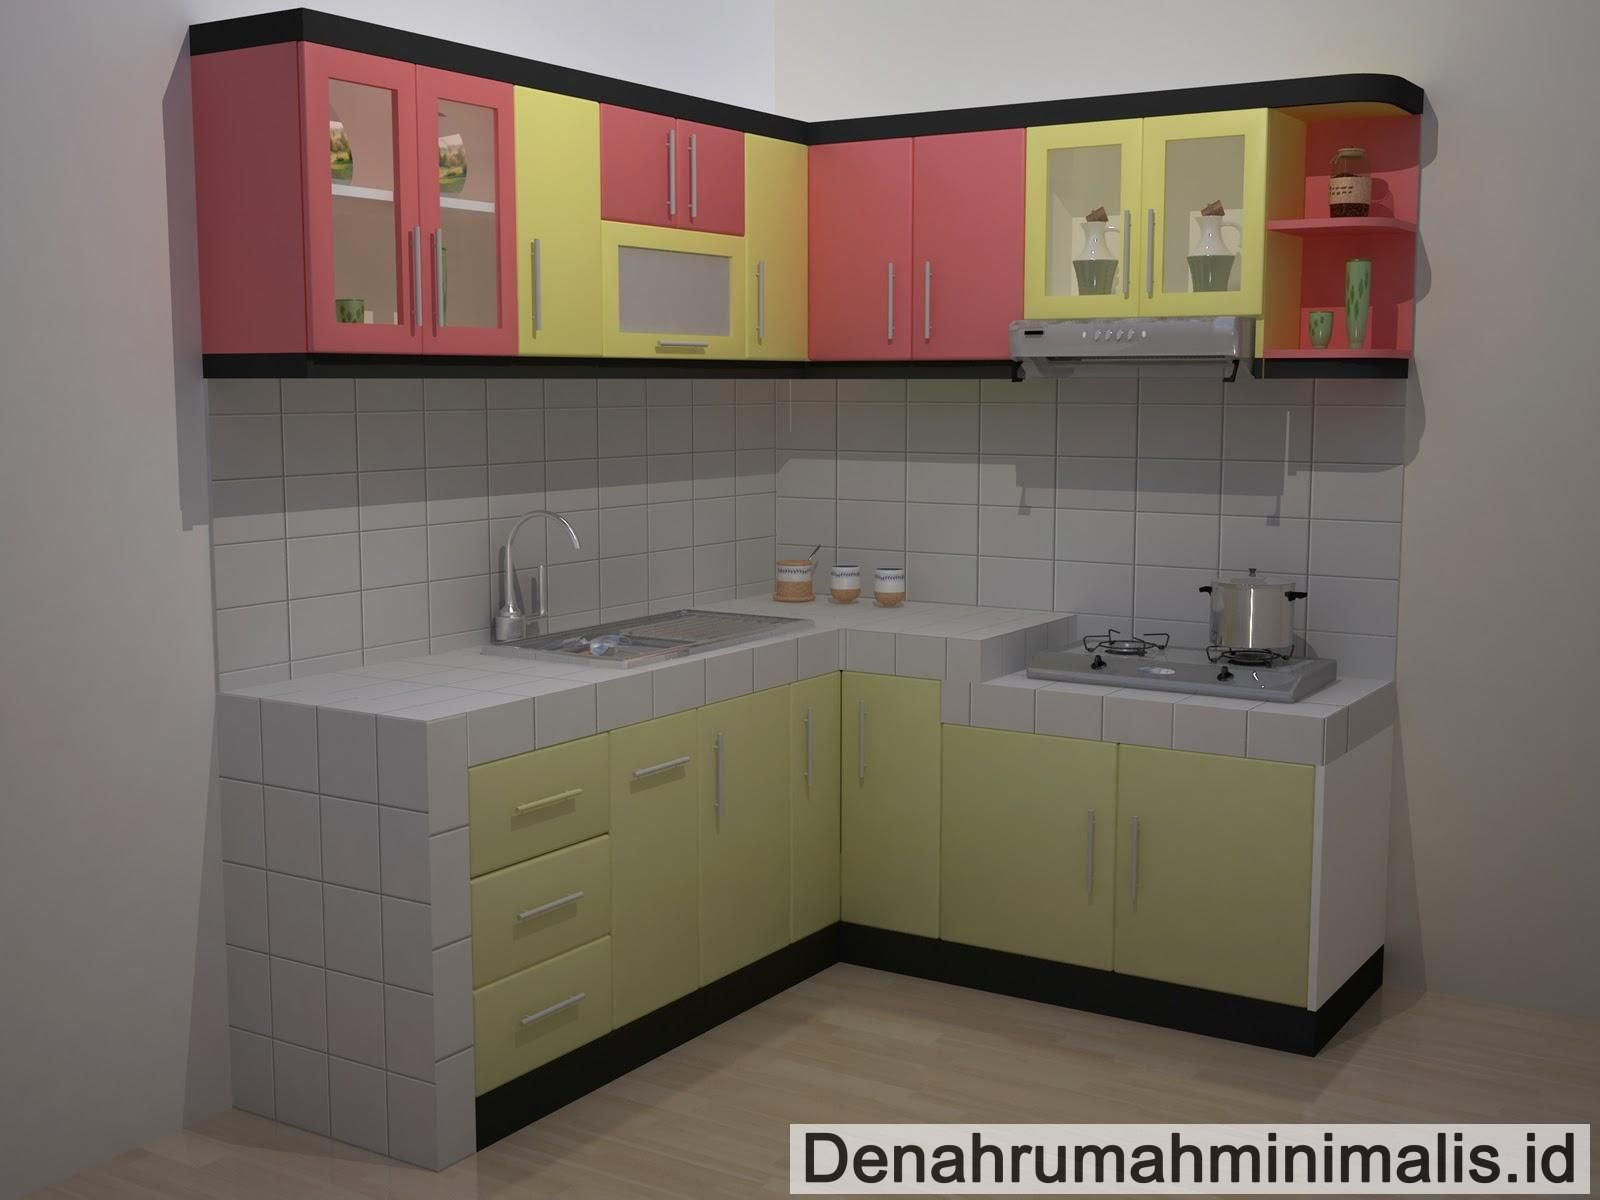 pin by ria shaumi on diy | pinterest | false ceiling ideas, ceiling